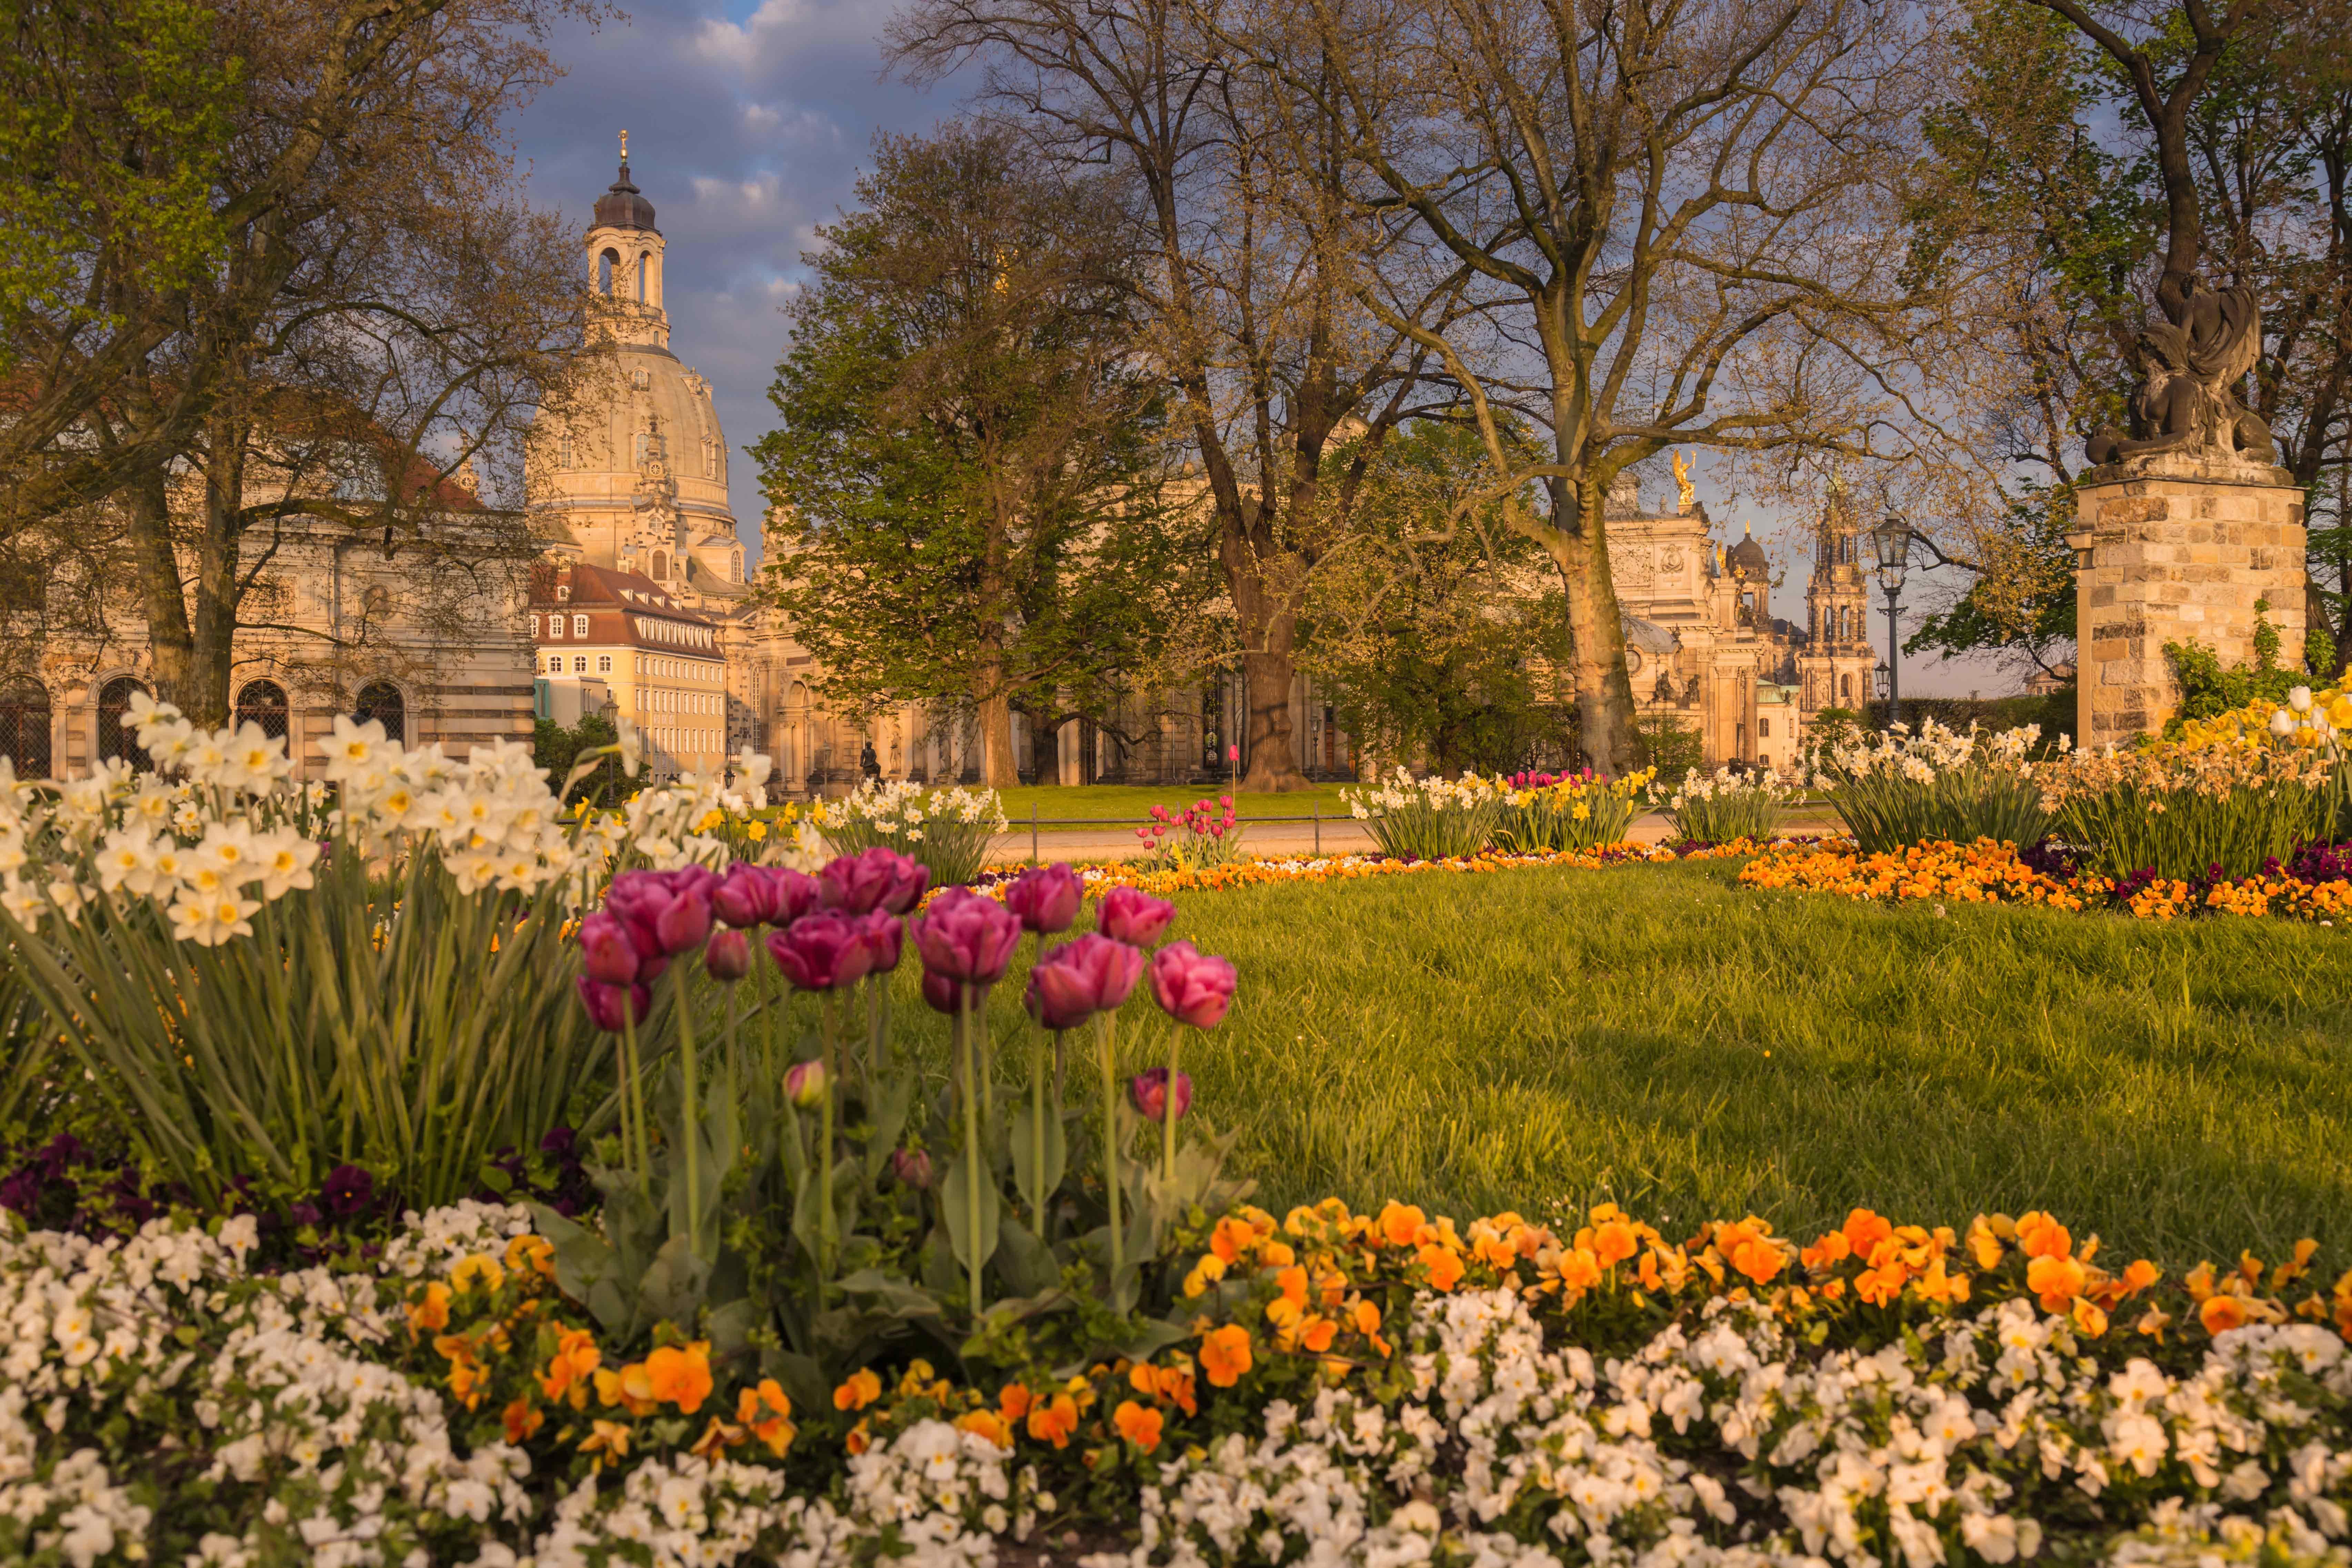 Brühlsche Terrasse im Frühling